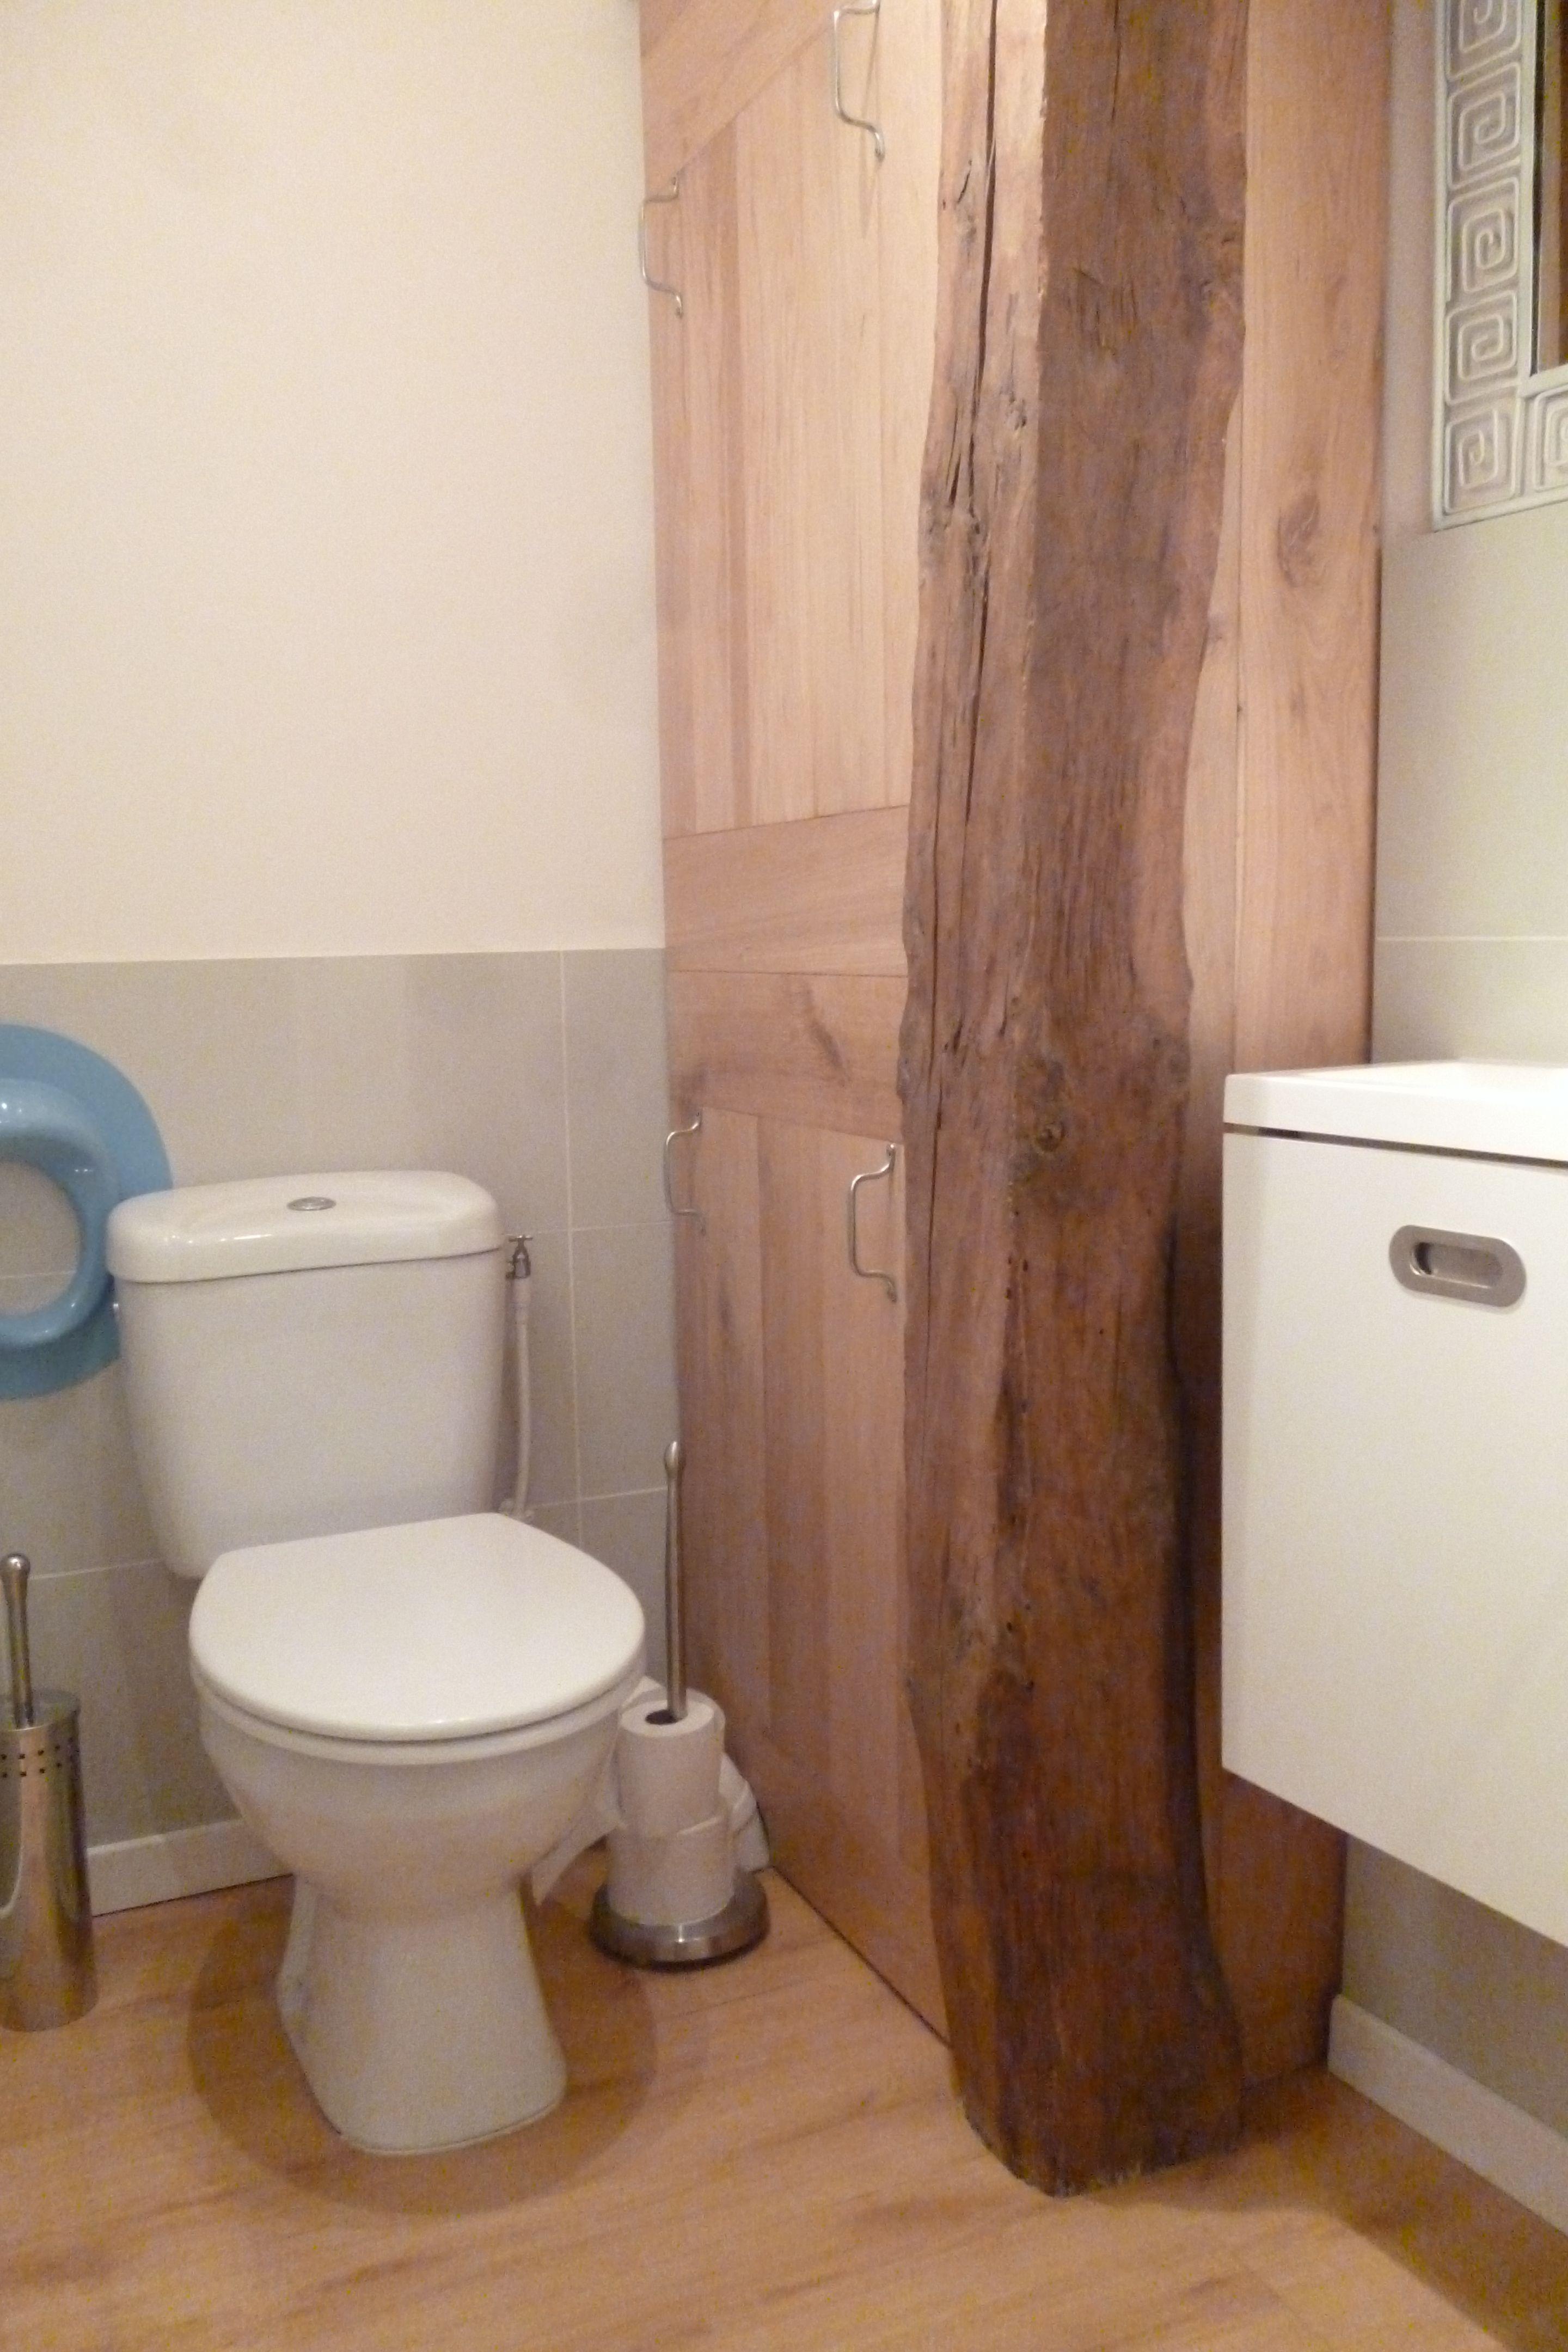 Discount Home Made Restroom Toilettes Economique Trone 40